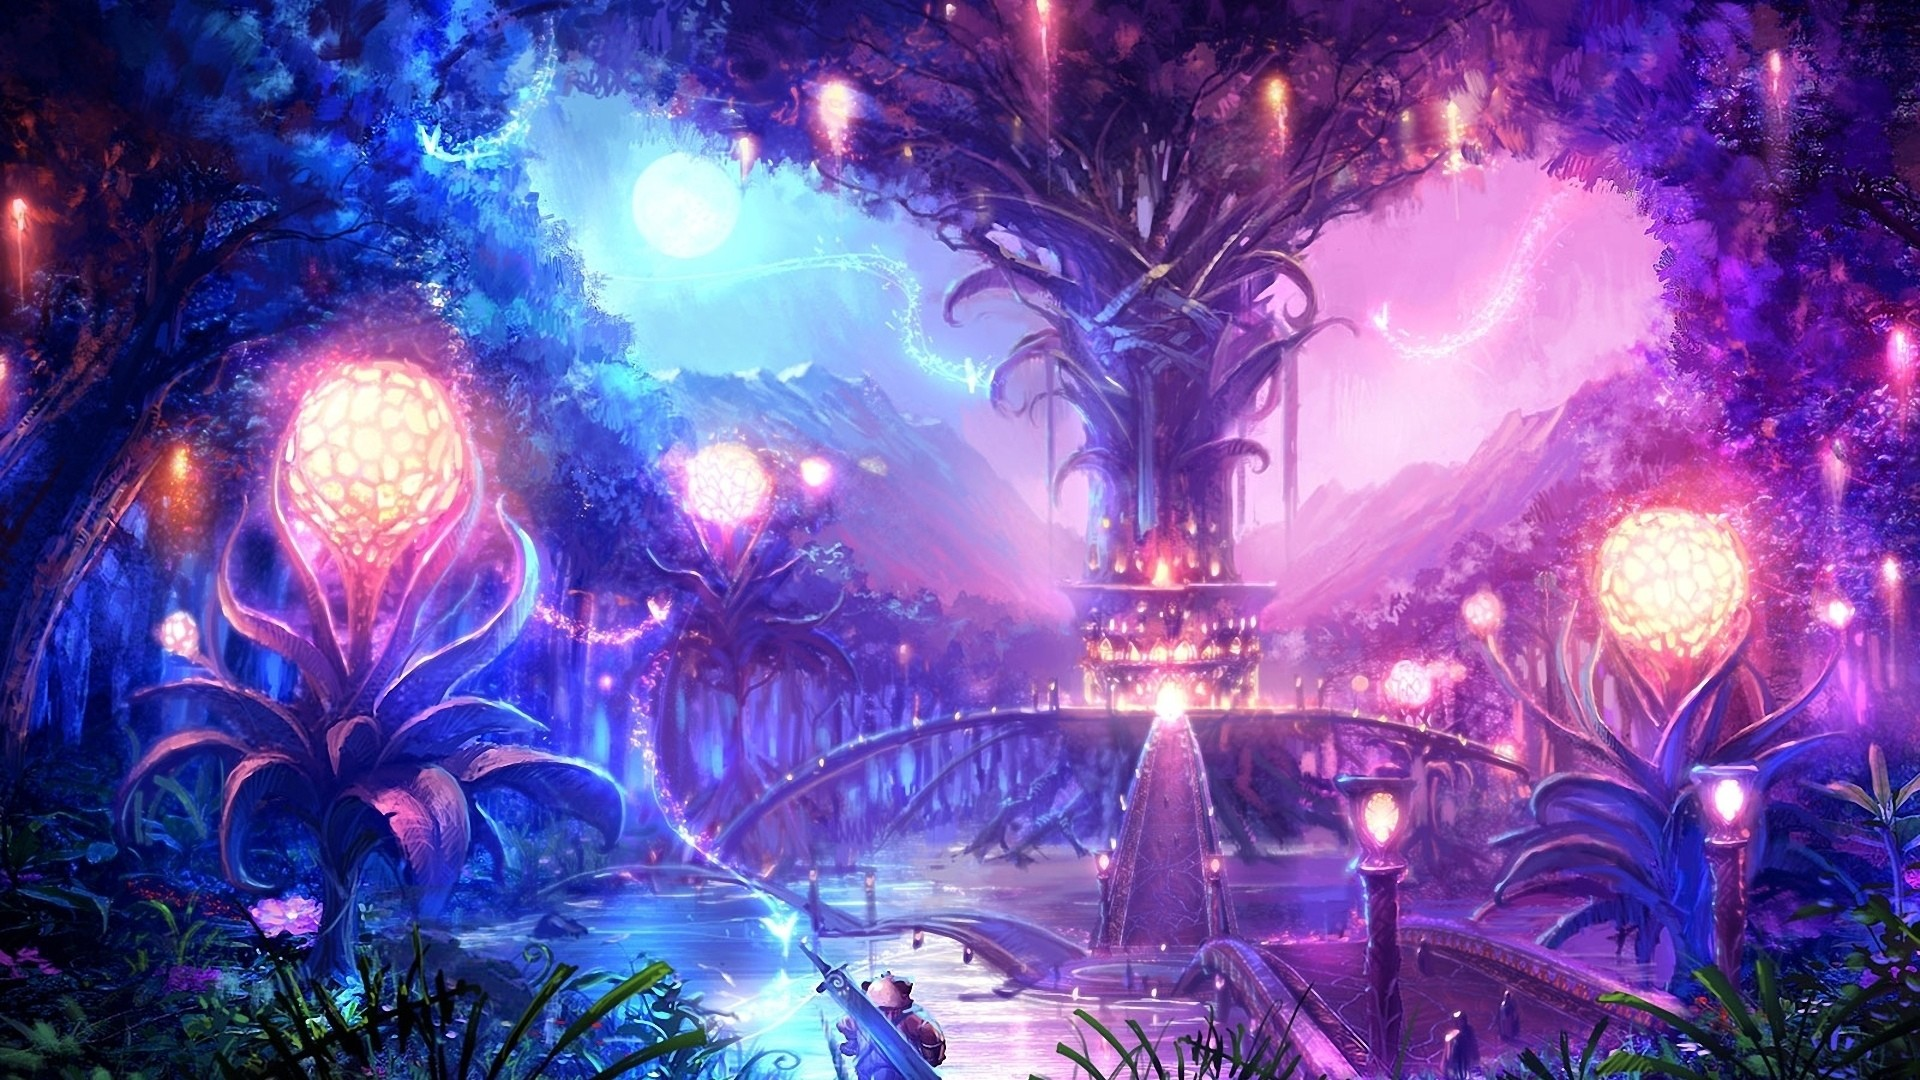 Anime Fantasy Wallpaper 74 Images